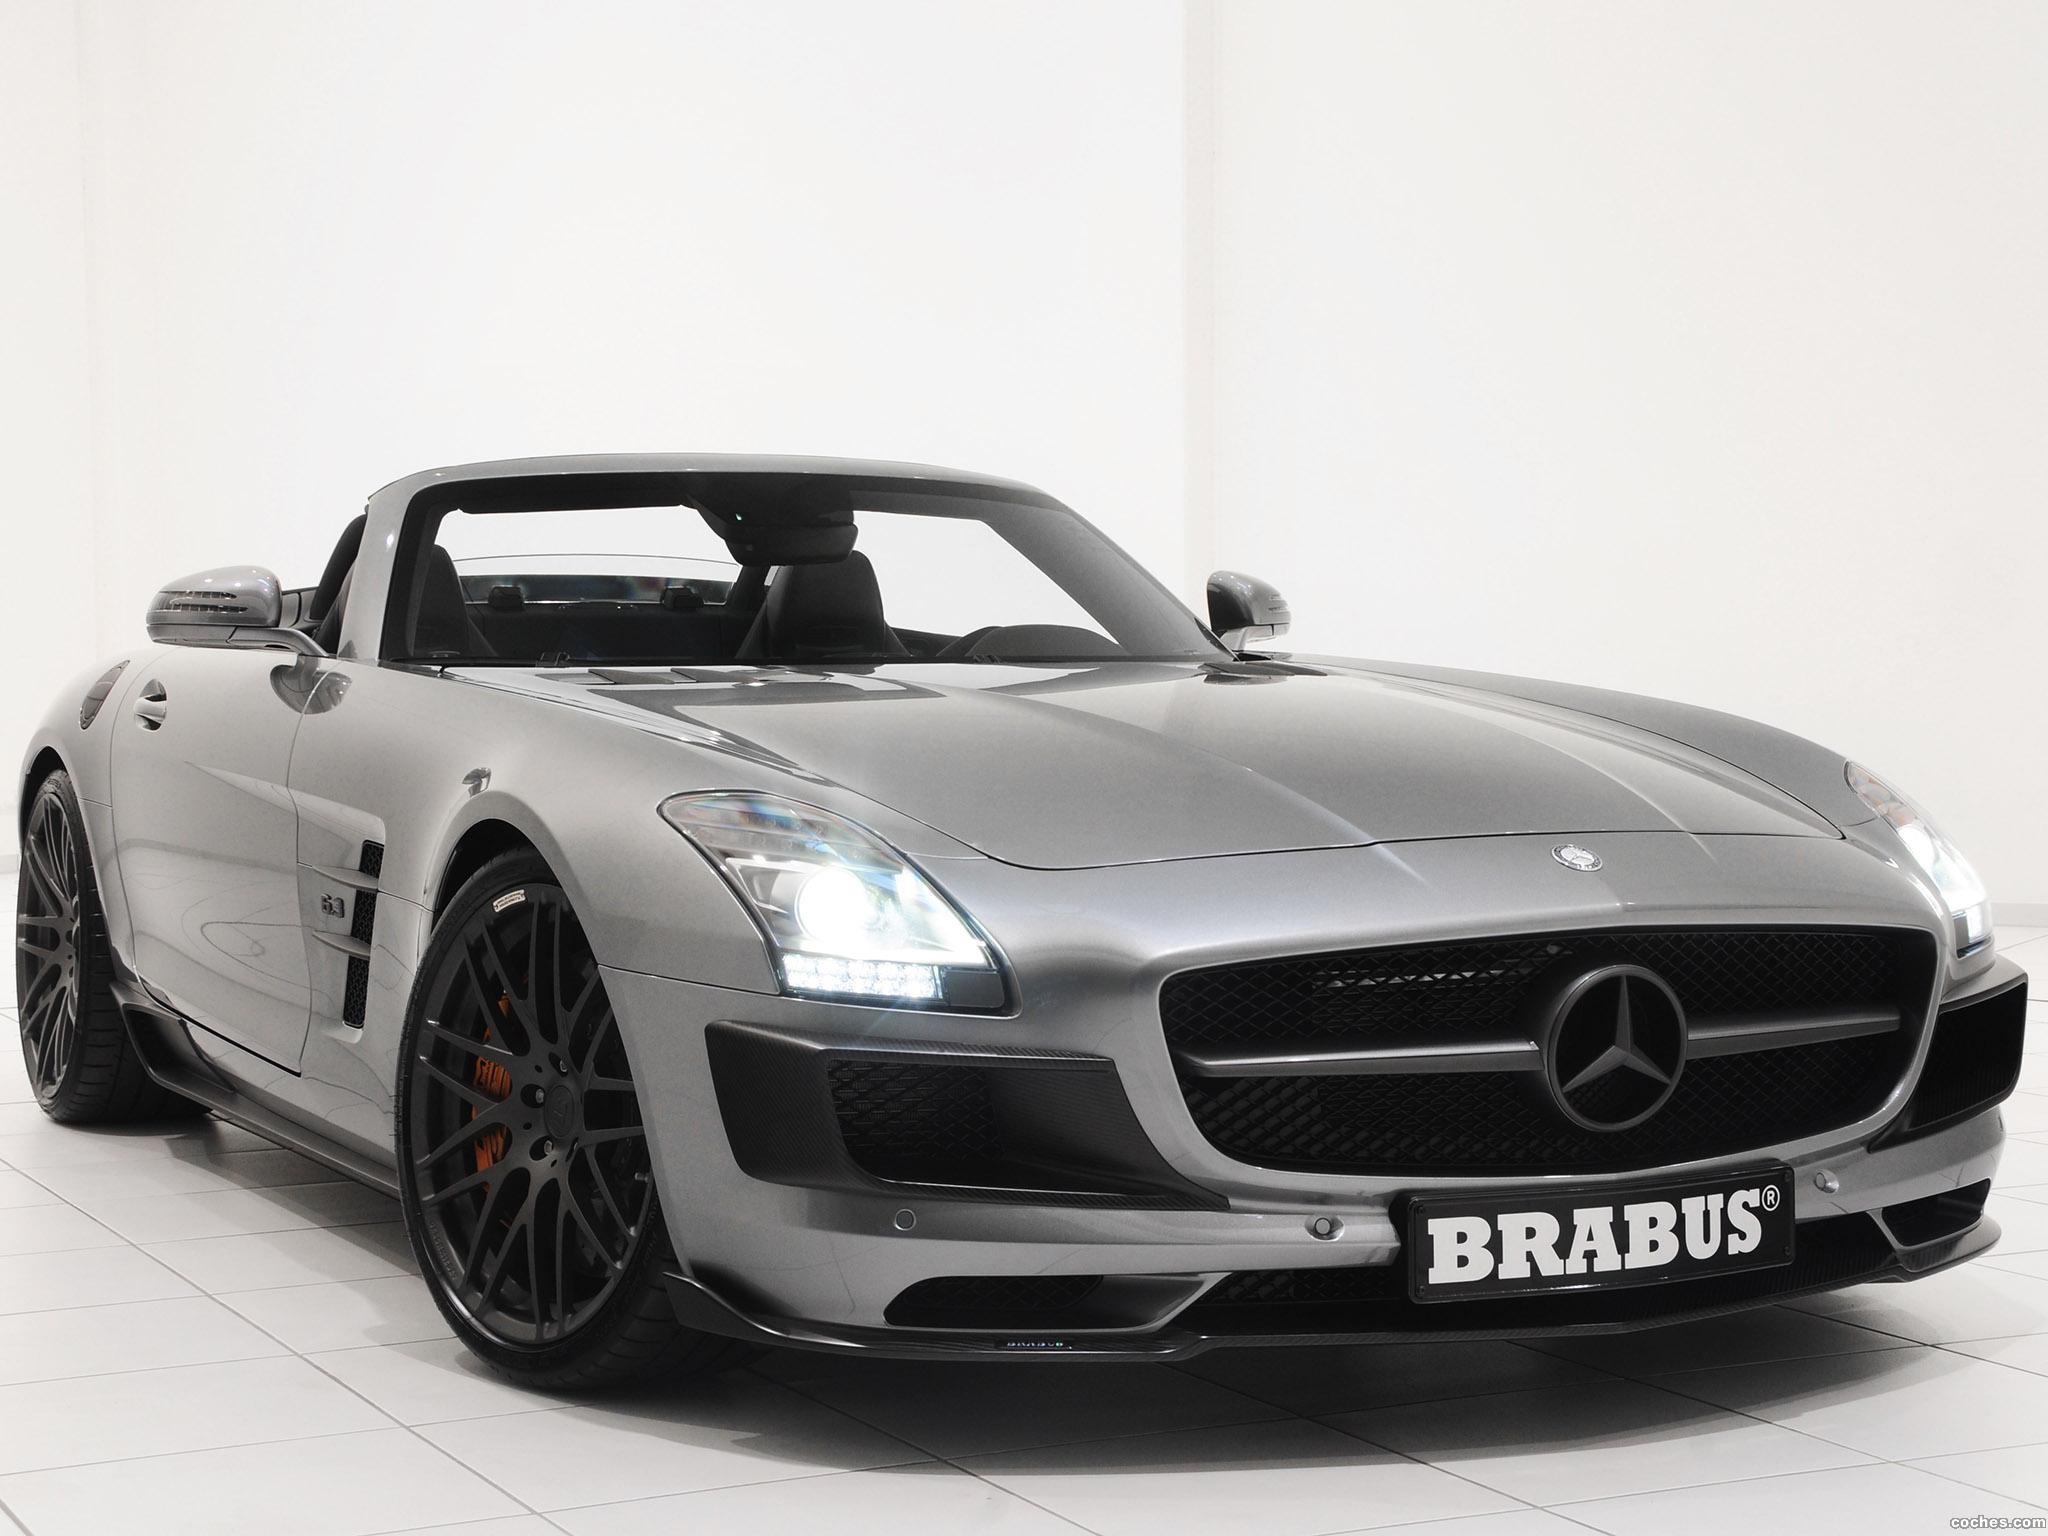 brabus_amg-mercedes-sls-roadster-2011_r13